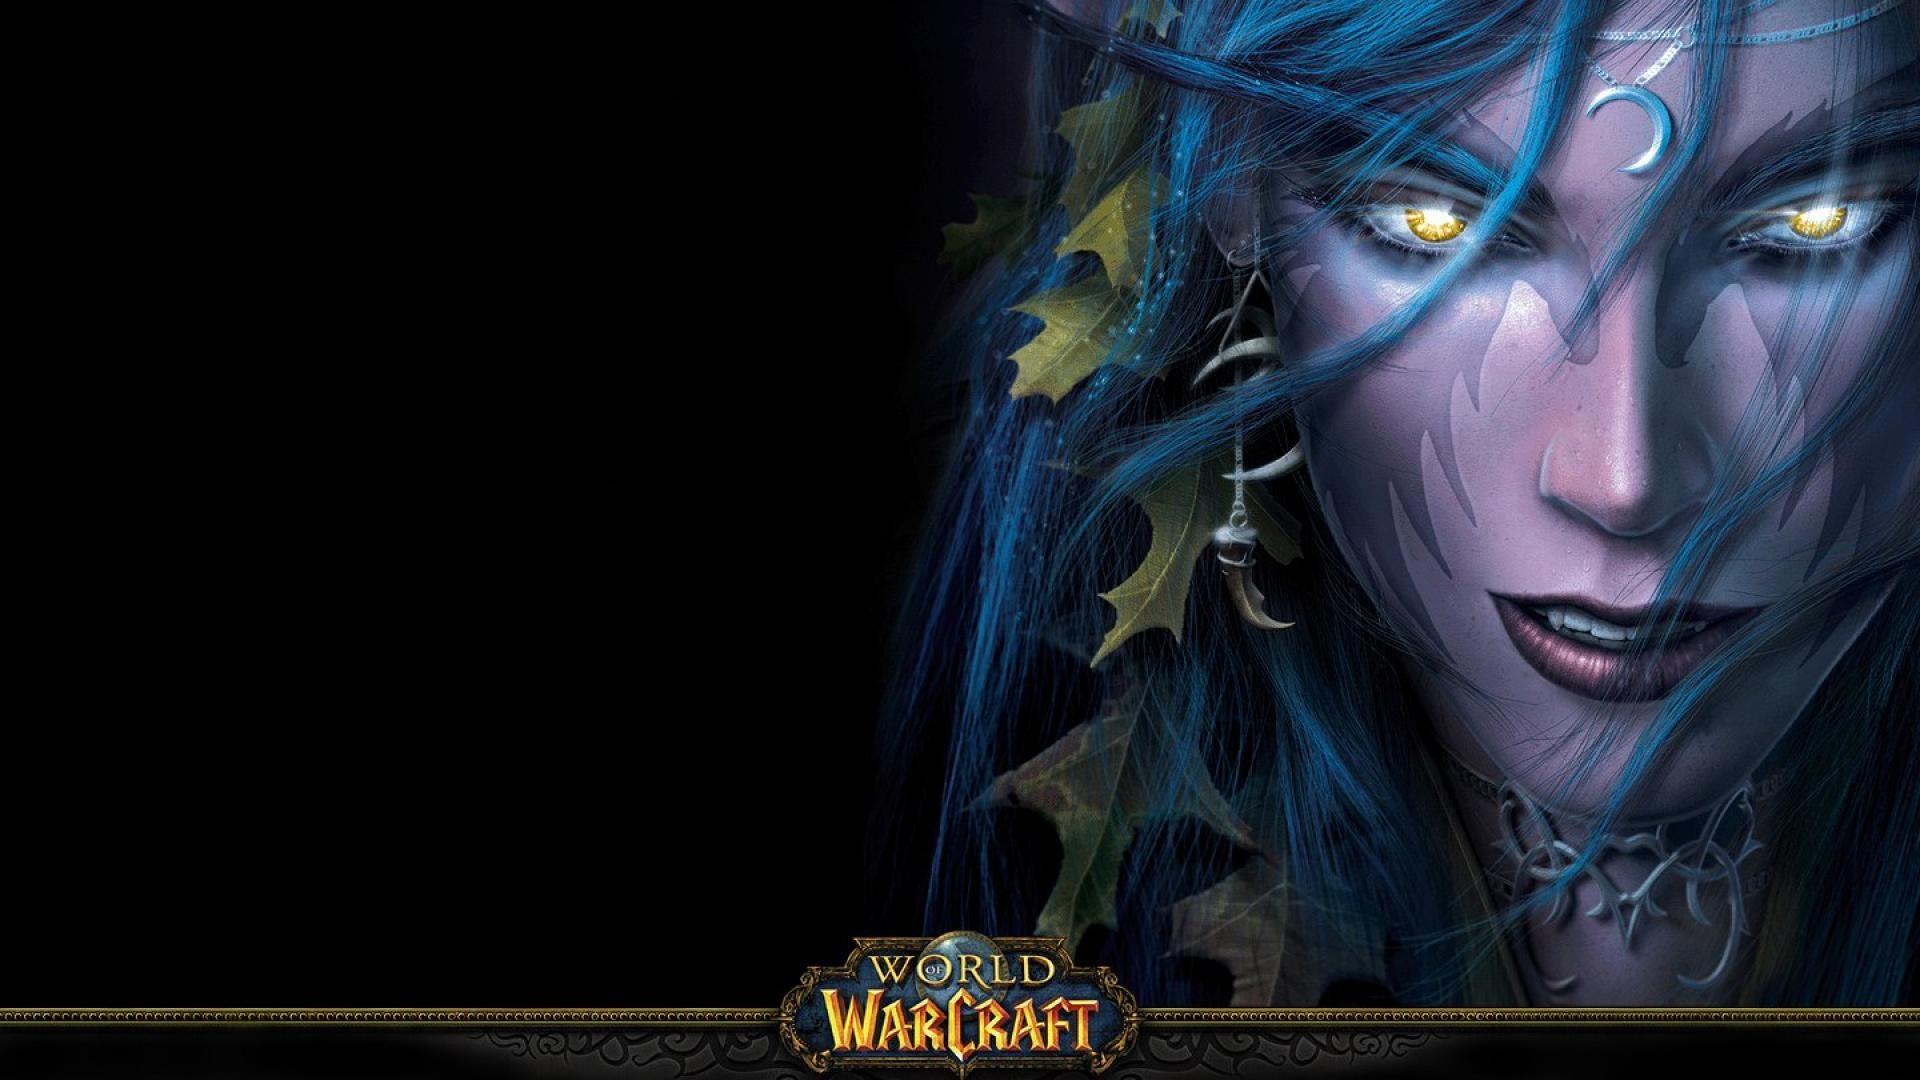 night s gangbang Warcraft elf